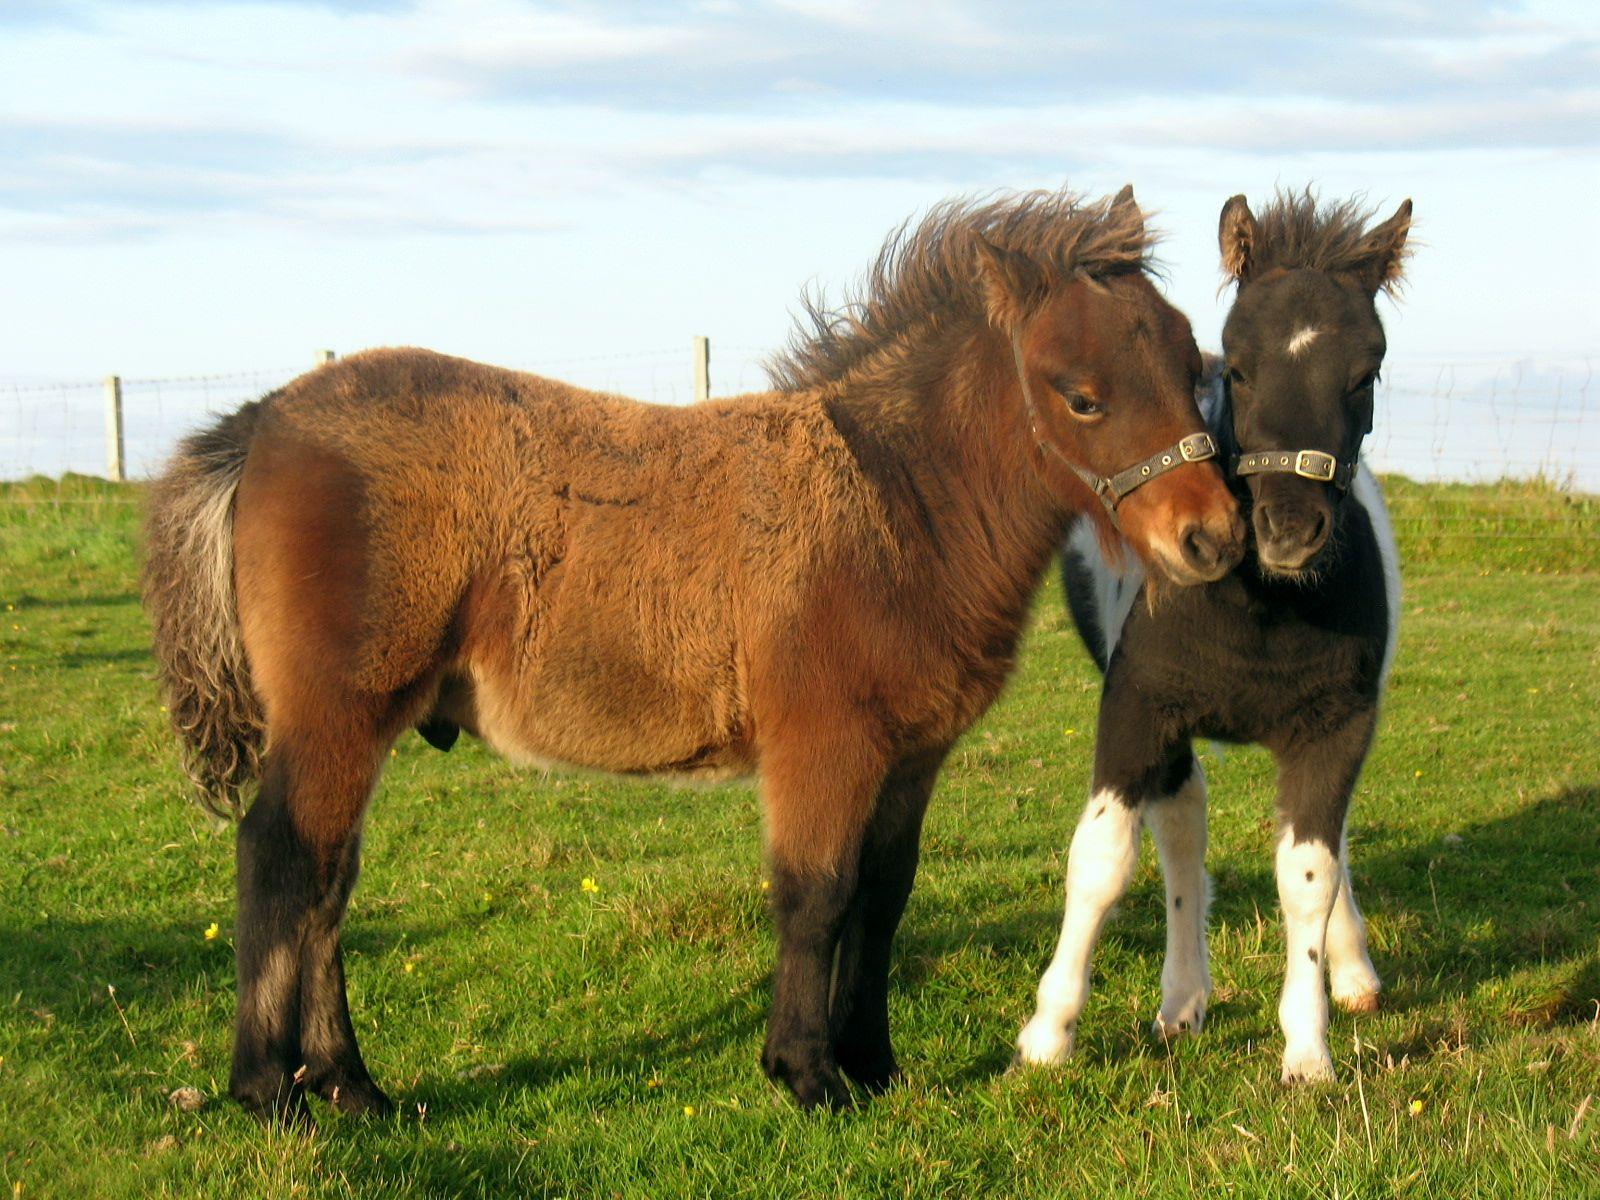 Lot 4 - Bay - Standard - Colt Foal, - DOB: 1st June 2017